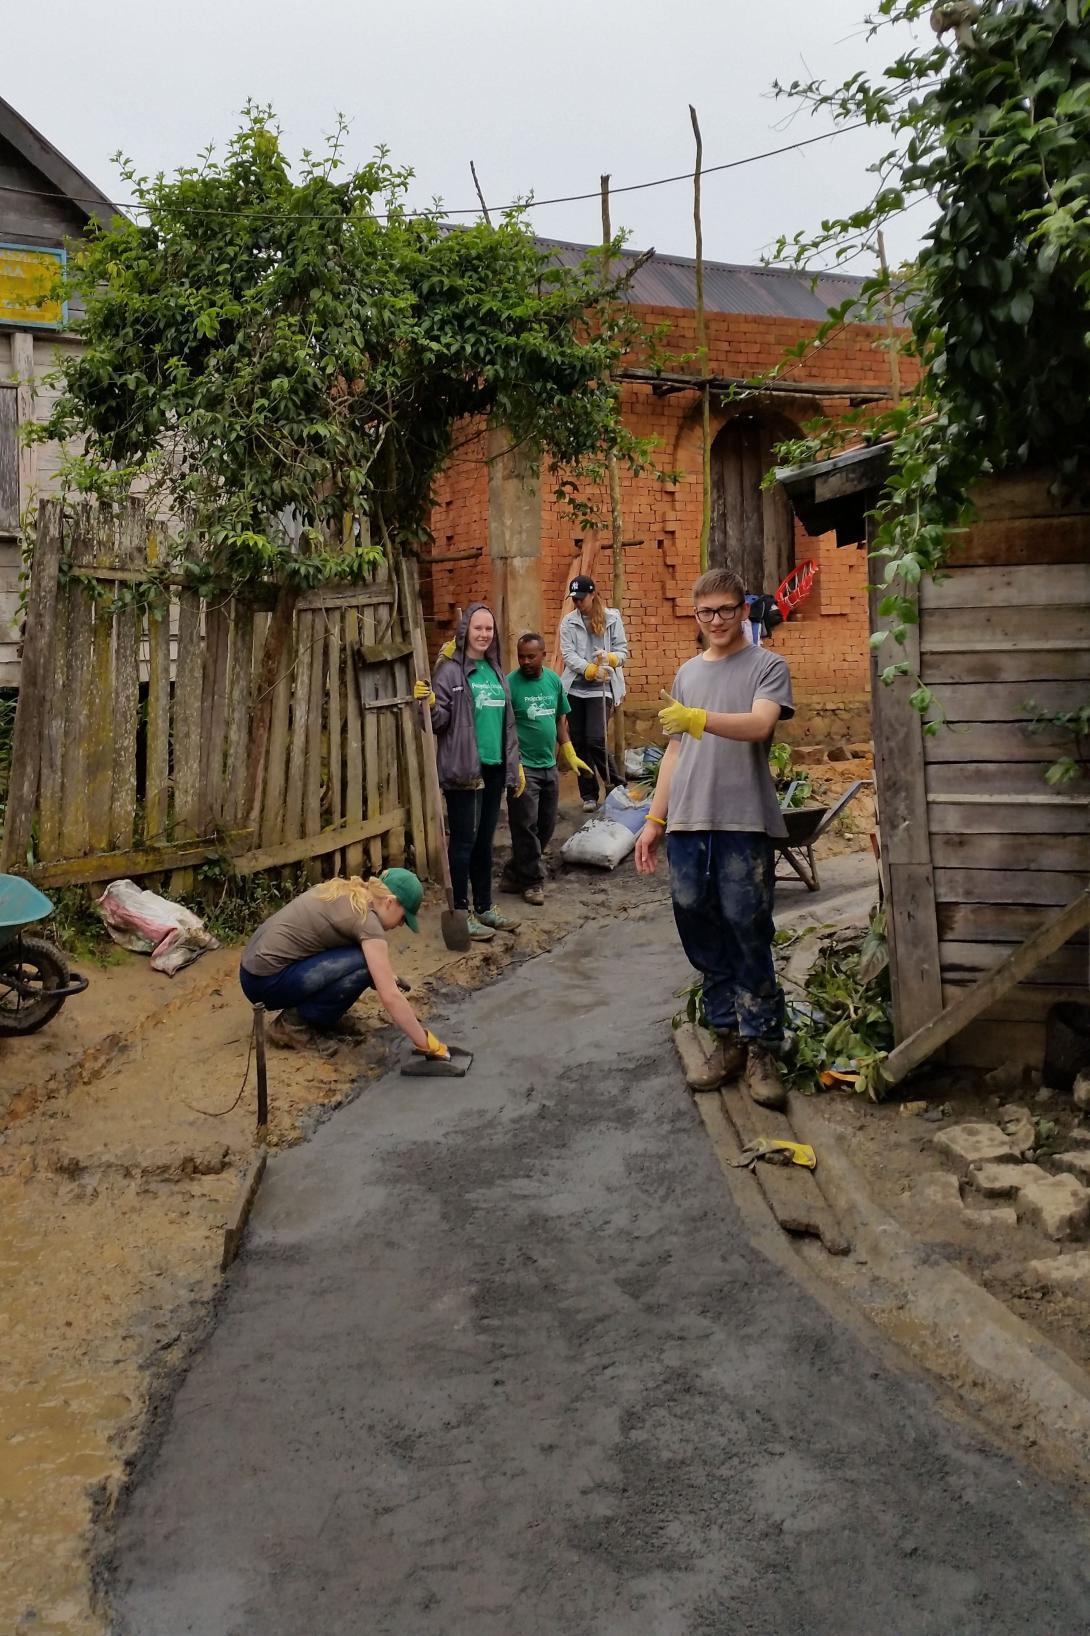 Volunteers in Africa building a road in Madagascar